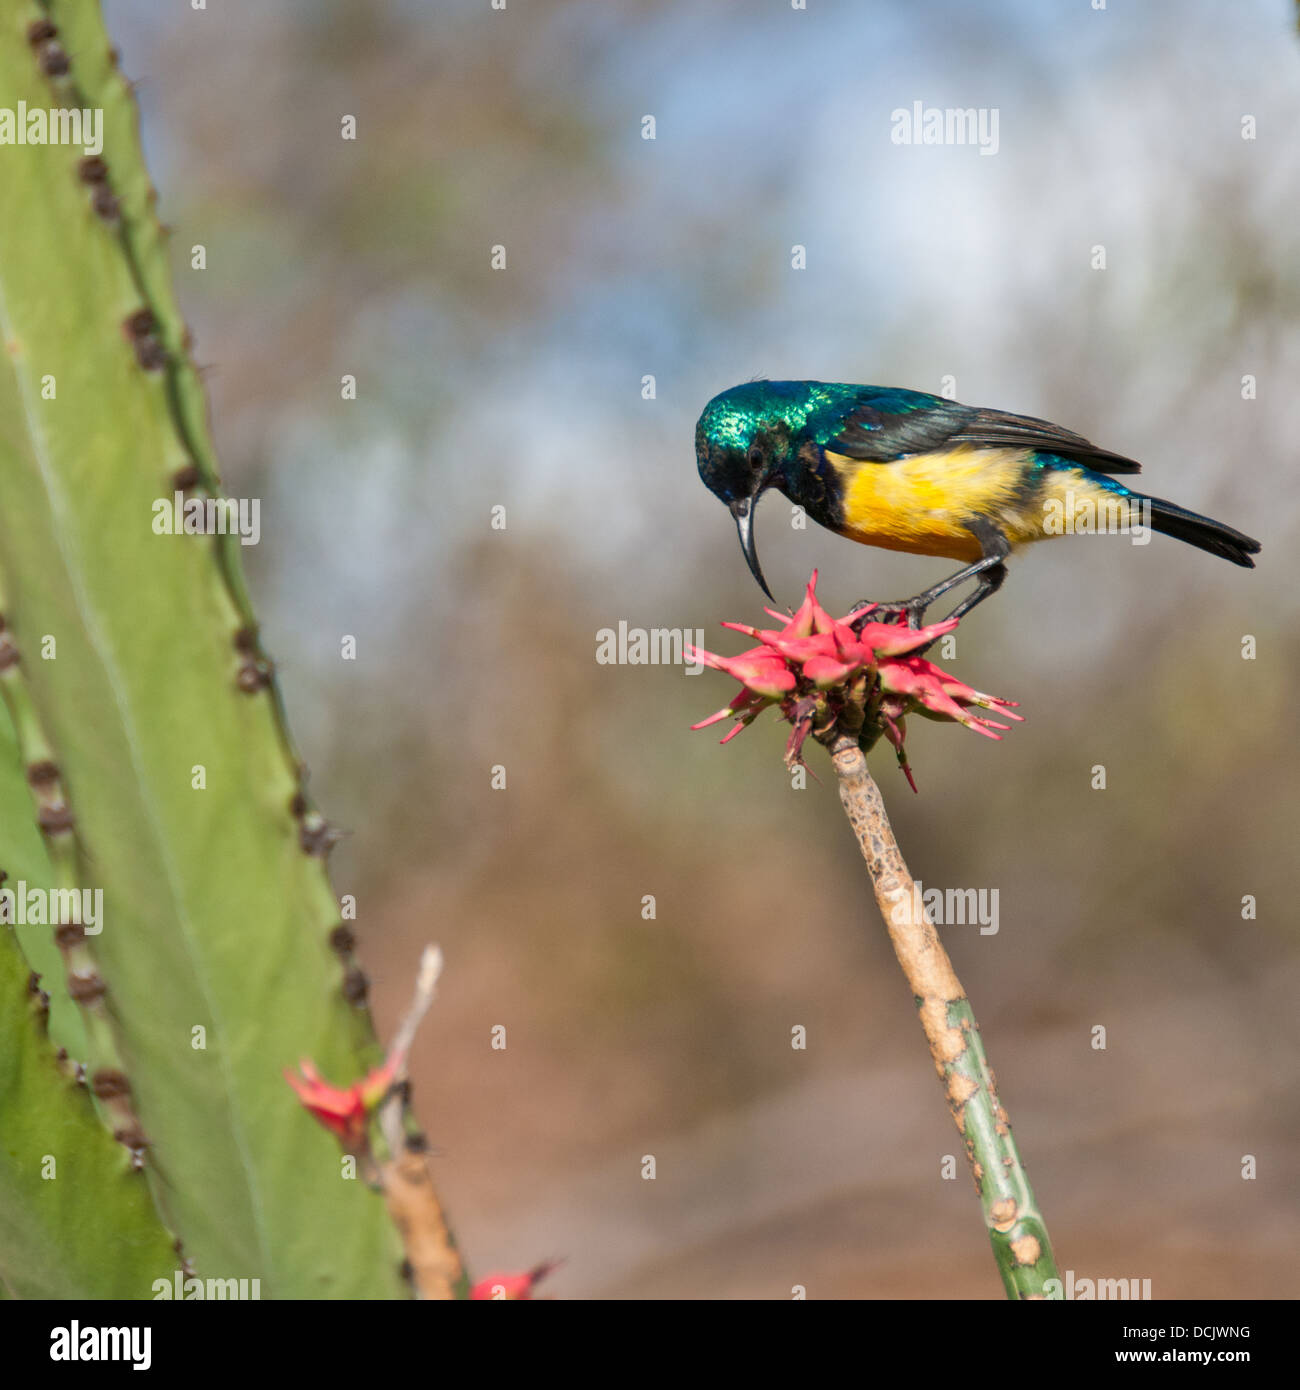 A collared sunbird eating at an Aloe Vera flower in Tanzania - Stock Image